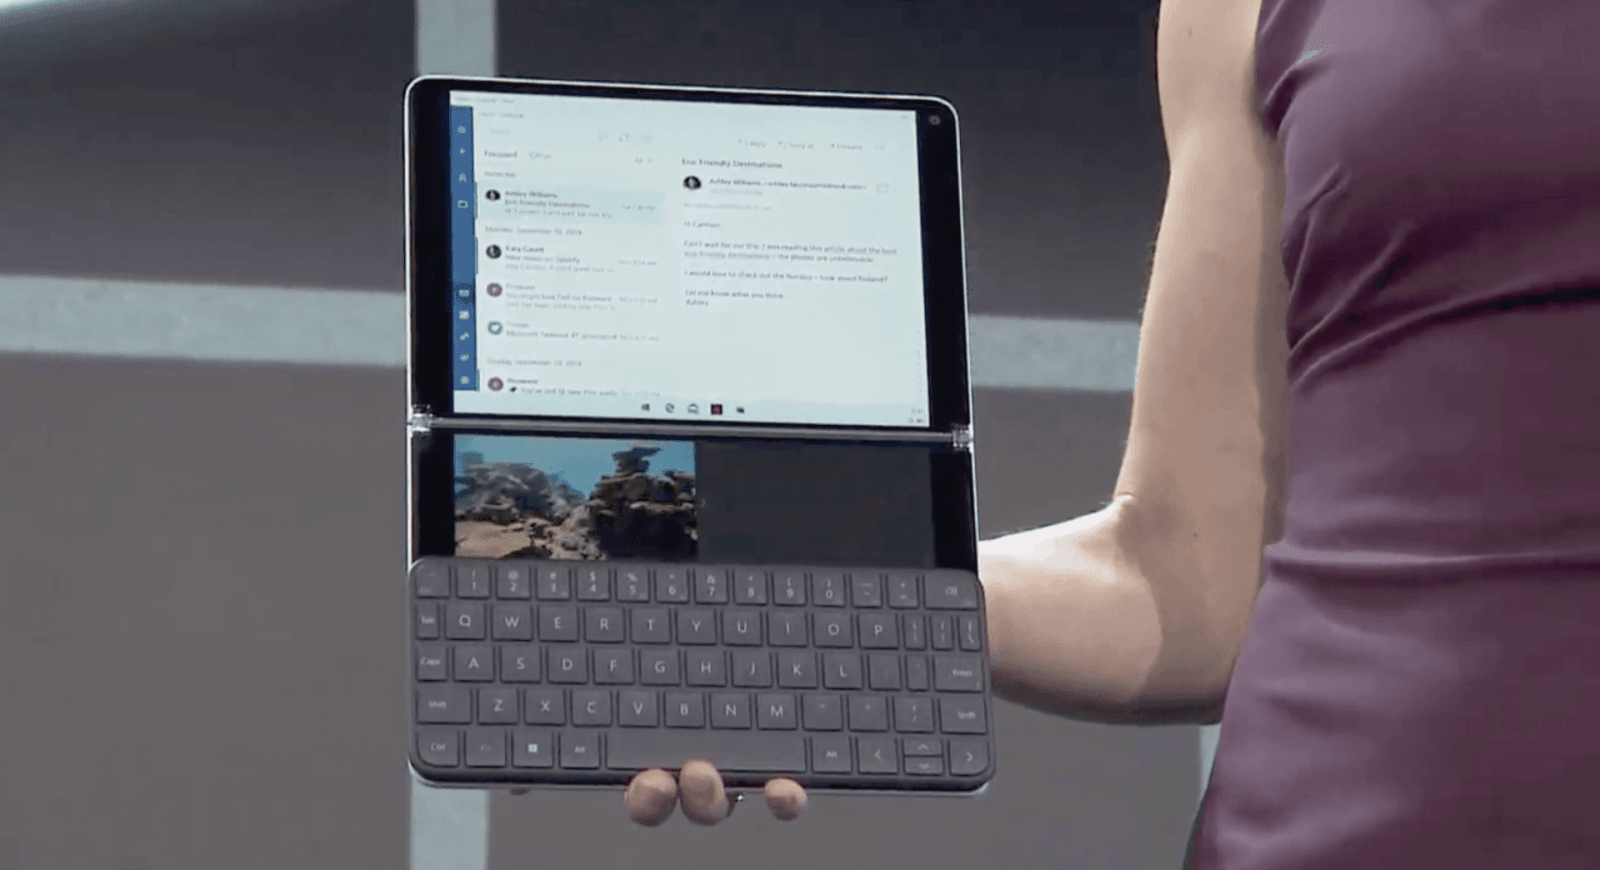 Microsoft анонсировала новую ОС Windows 10X (screen shot 2019 10 02 at 8.18.28 pm)